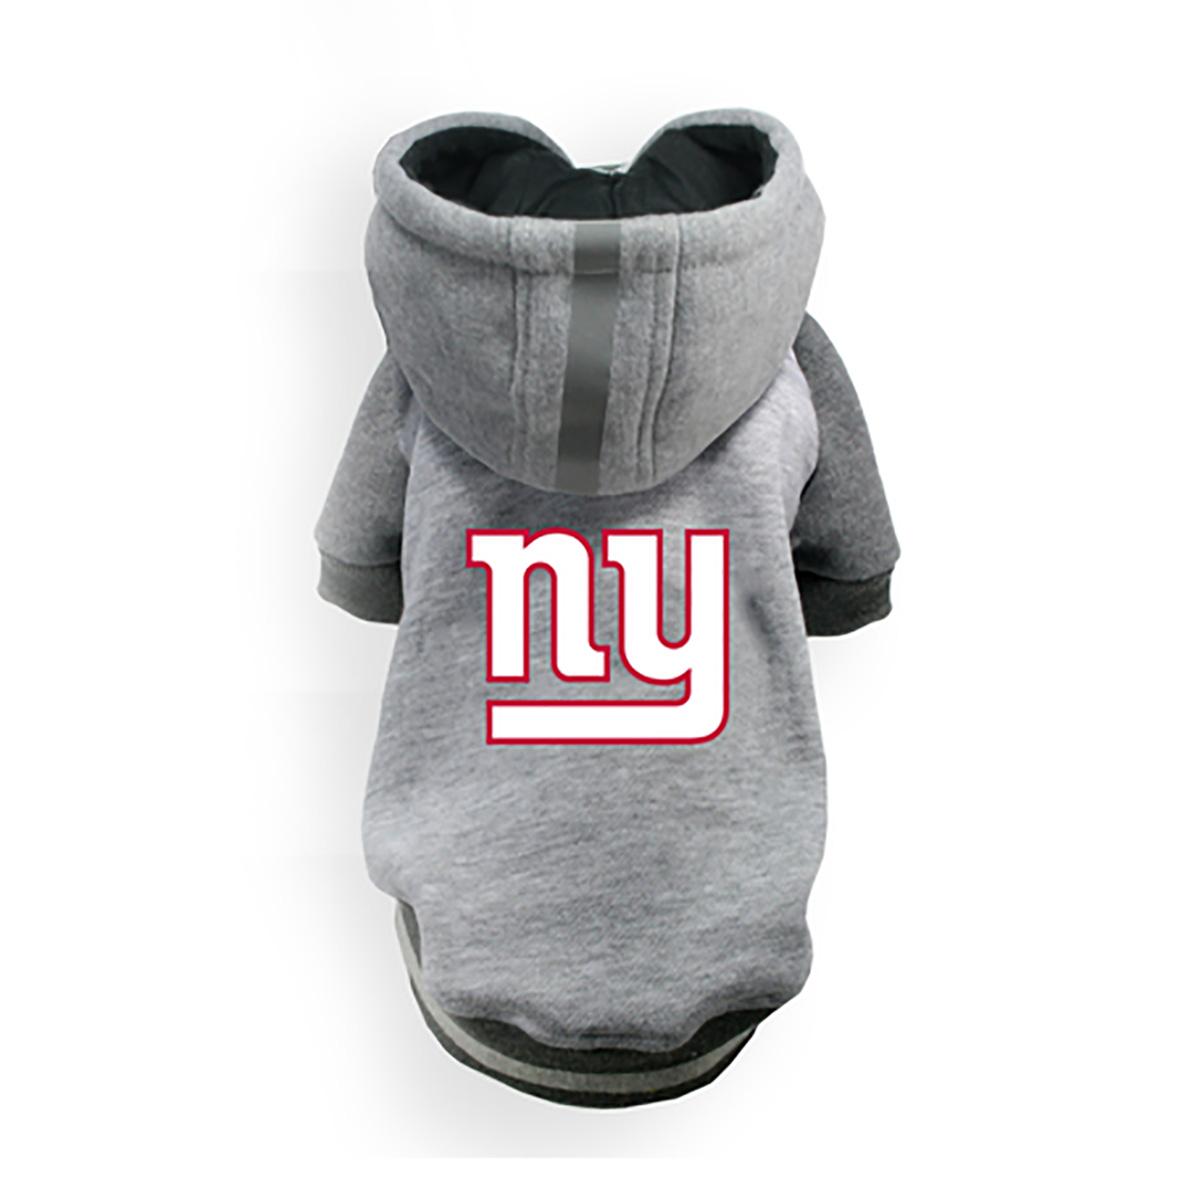 huge selection of ba651 9dfb6 New York Giants NFL Dog Hoodie - Gray